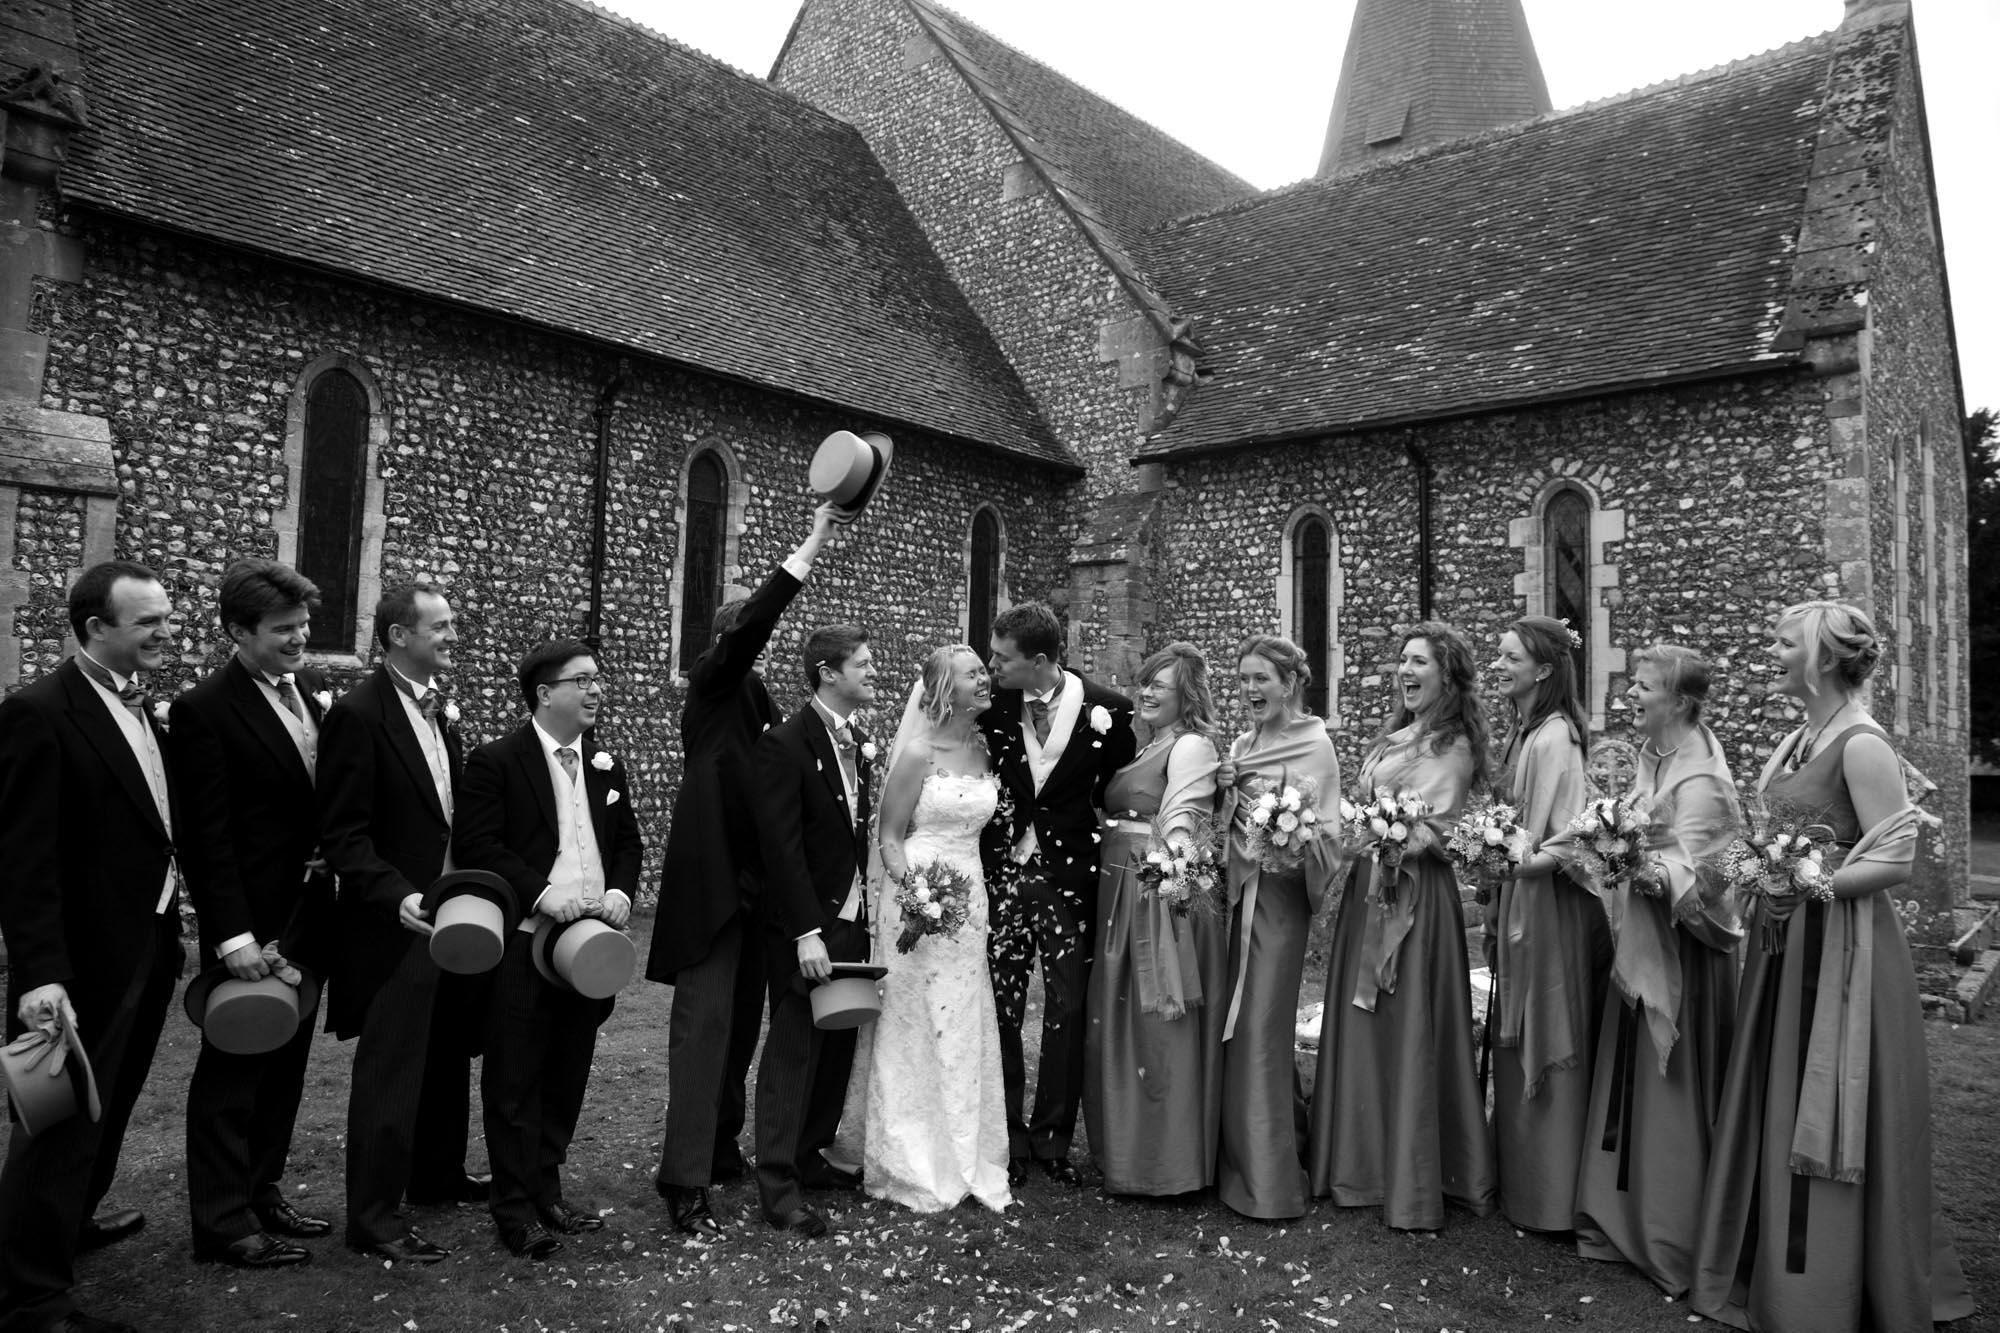 weddings-couples-love-photographer-oxford-london-jonathan-self-photography-57.jpg